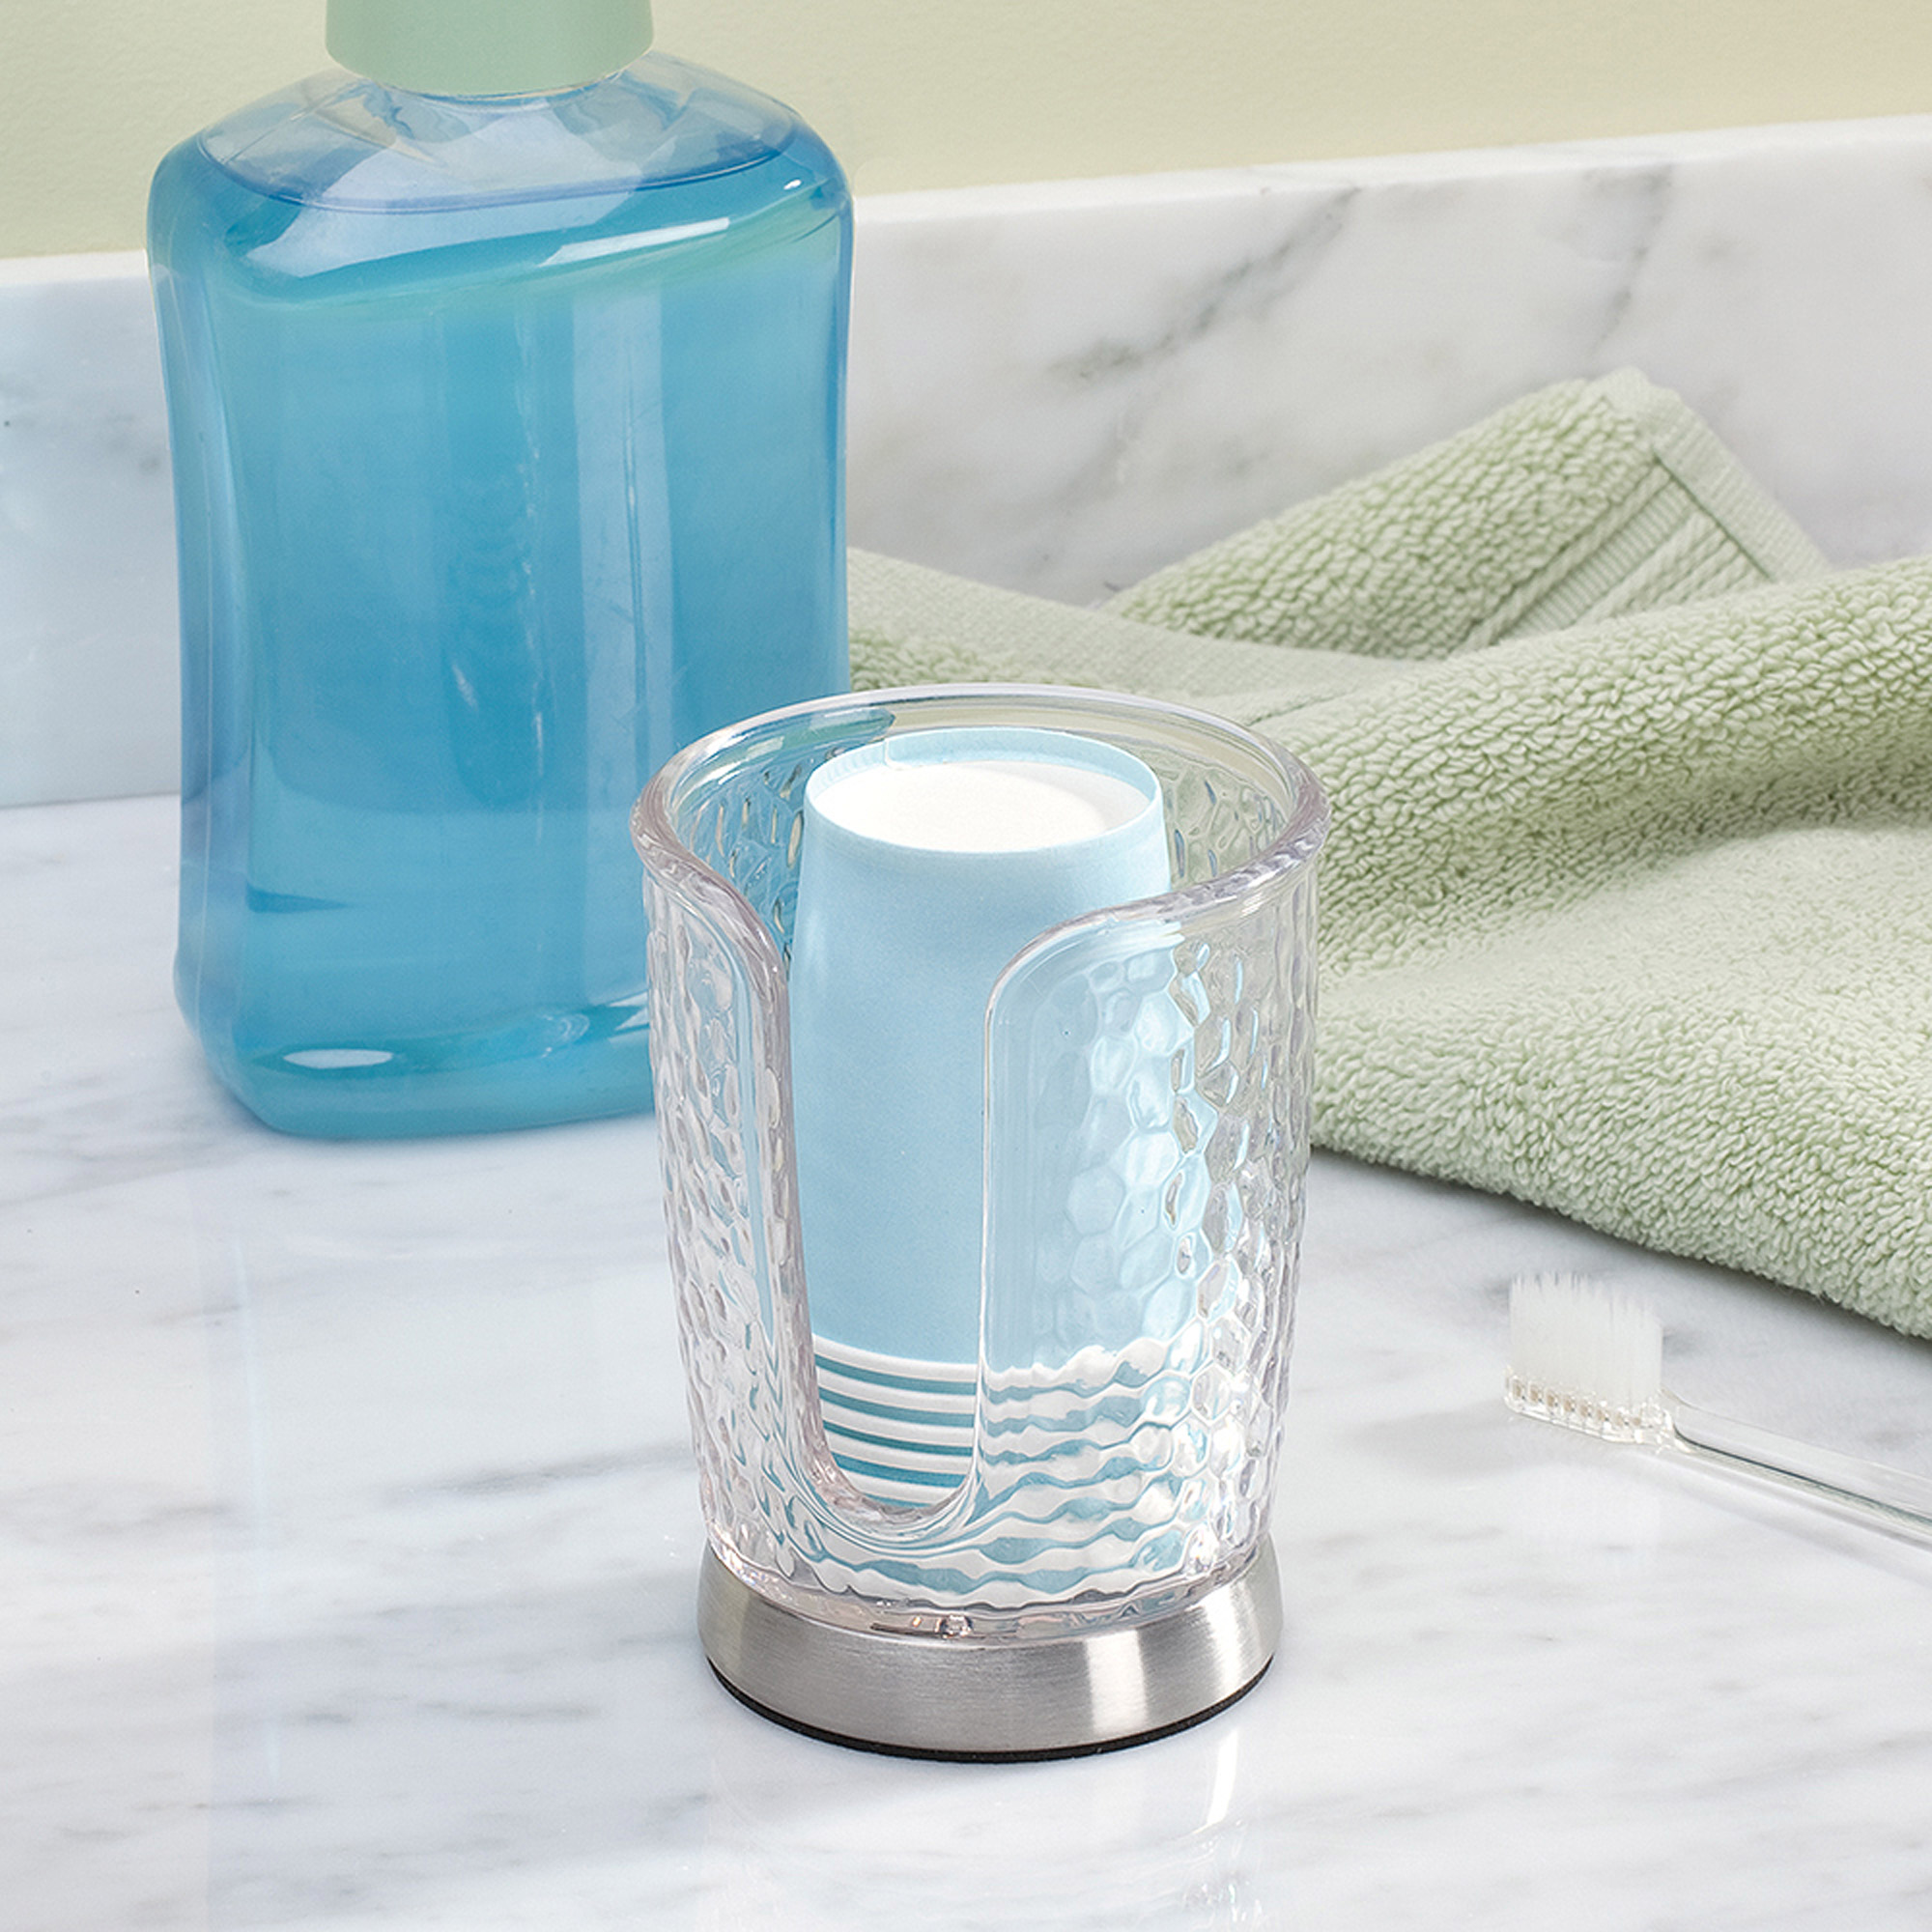 3 Oz Cup Dispenser Bathroom My Web Value